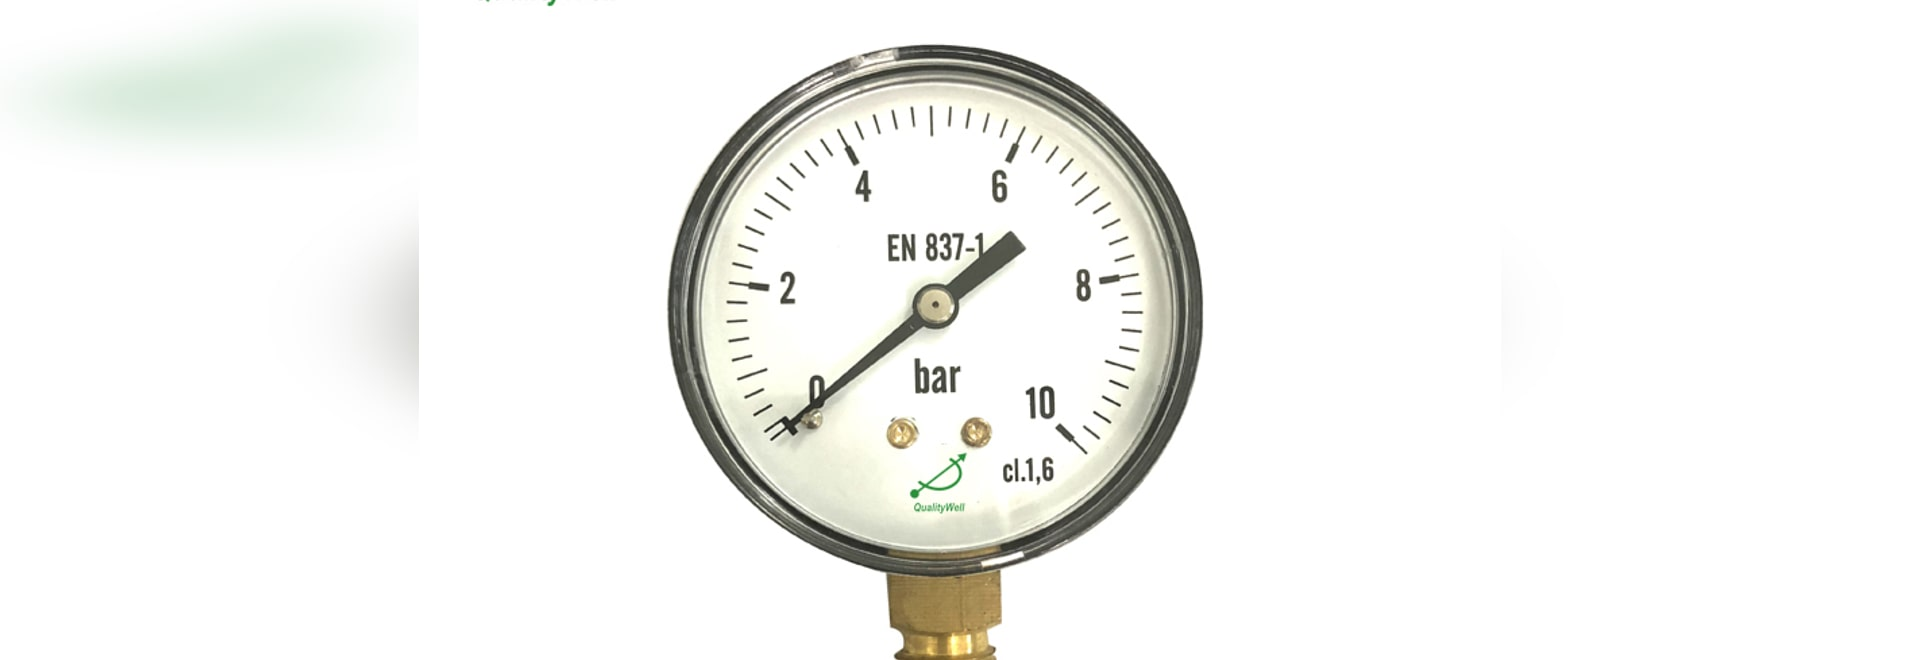 Selection of Pressure Gauge